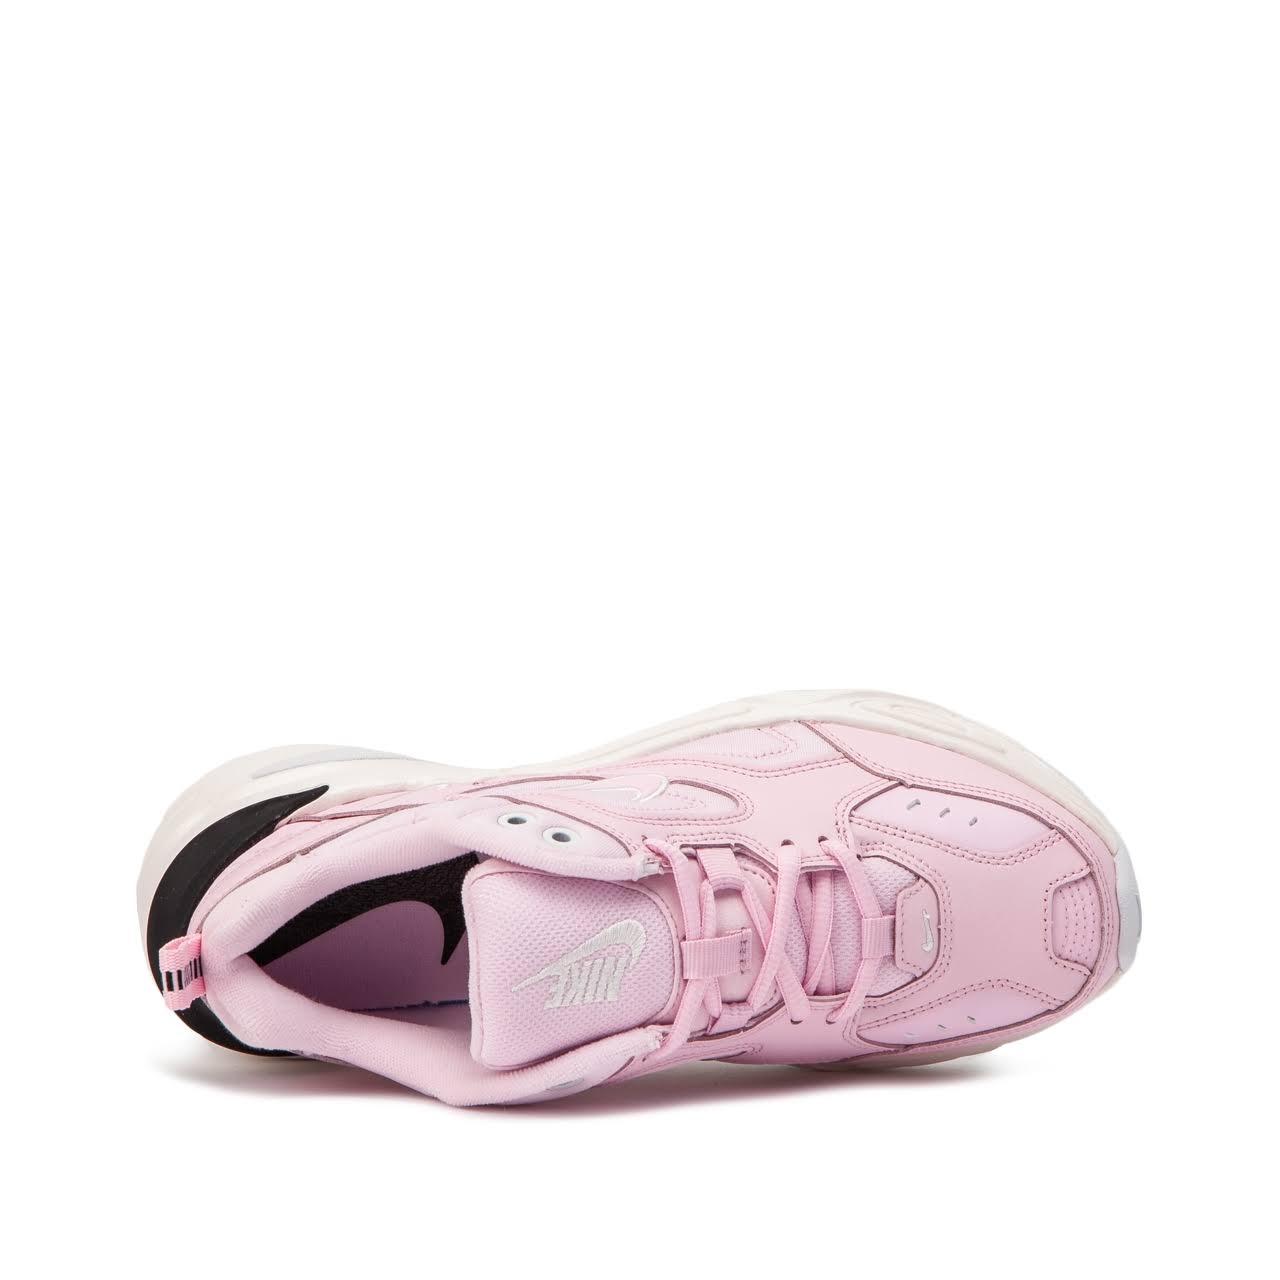 Foam' M2k Sneakers Nike 'pink Size Tekno Wmns Womens 5 0 vBqIa